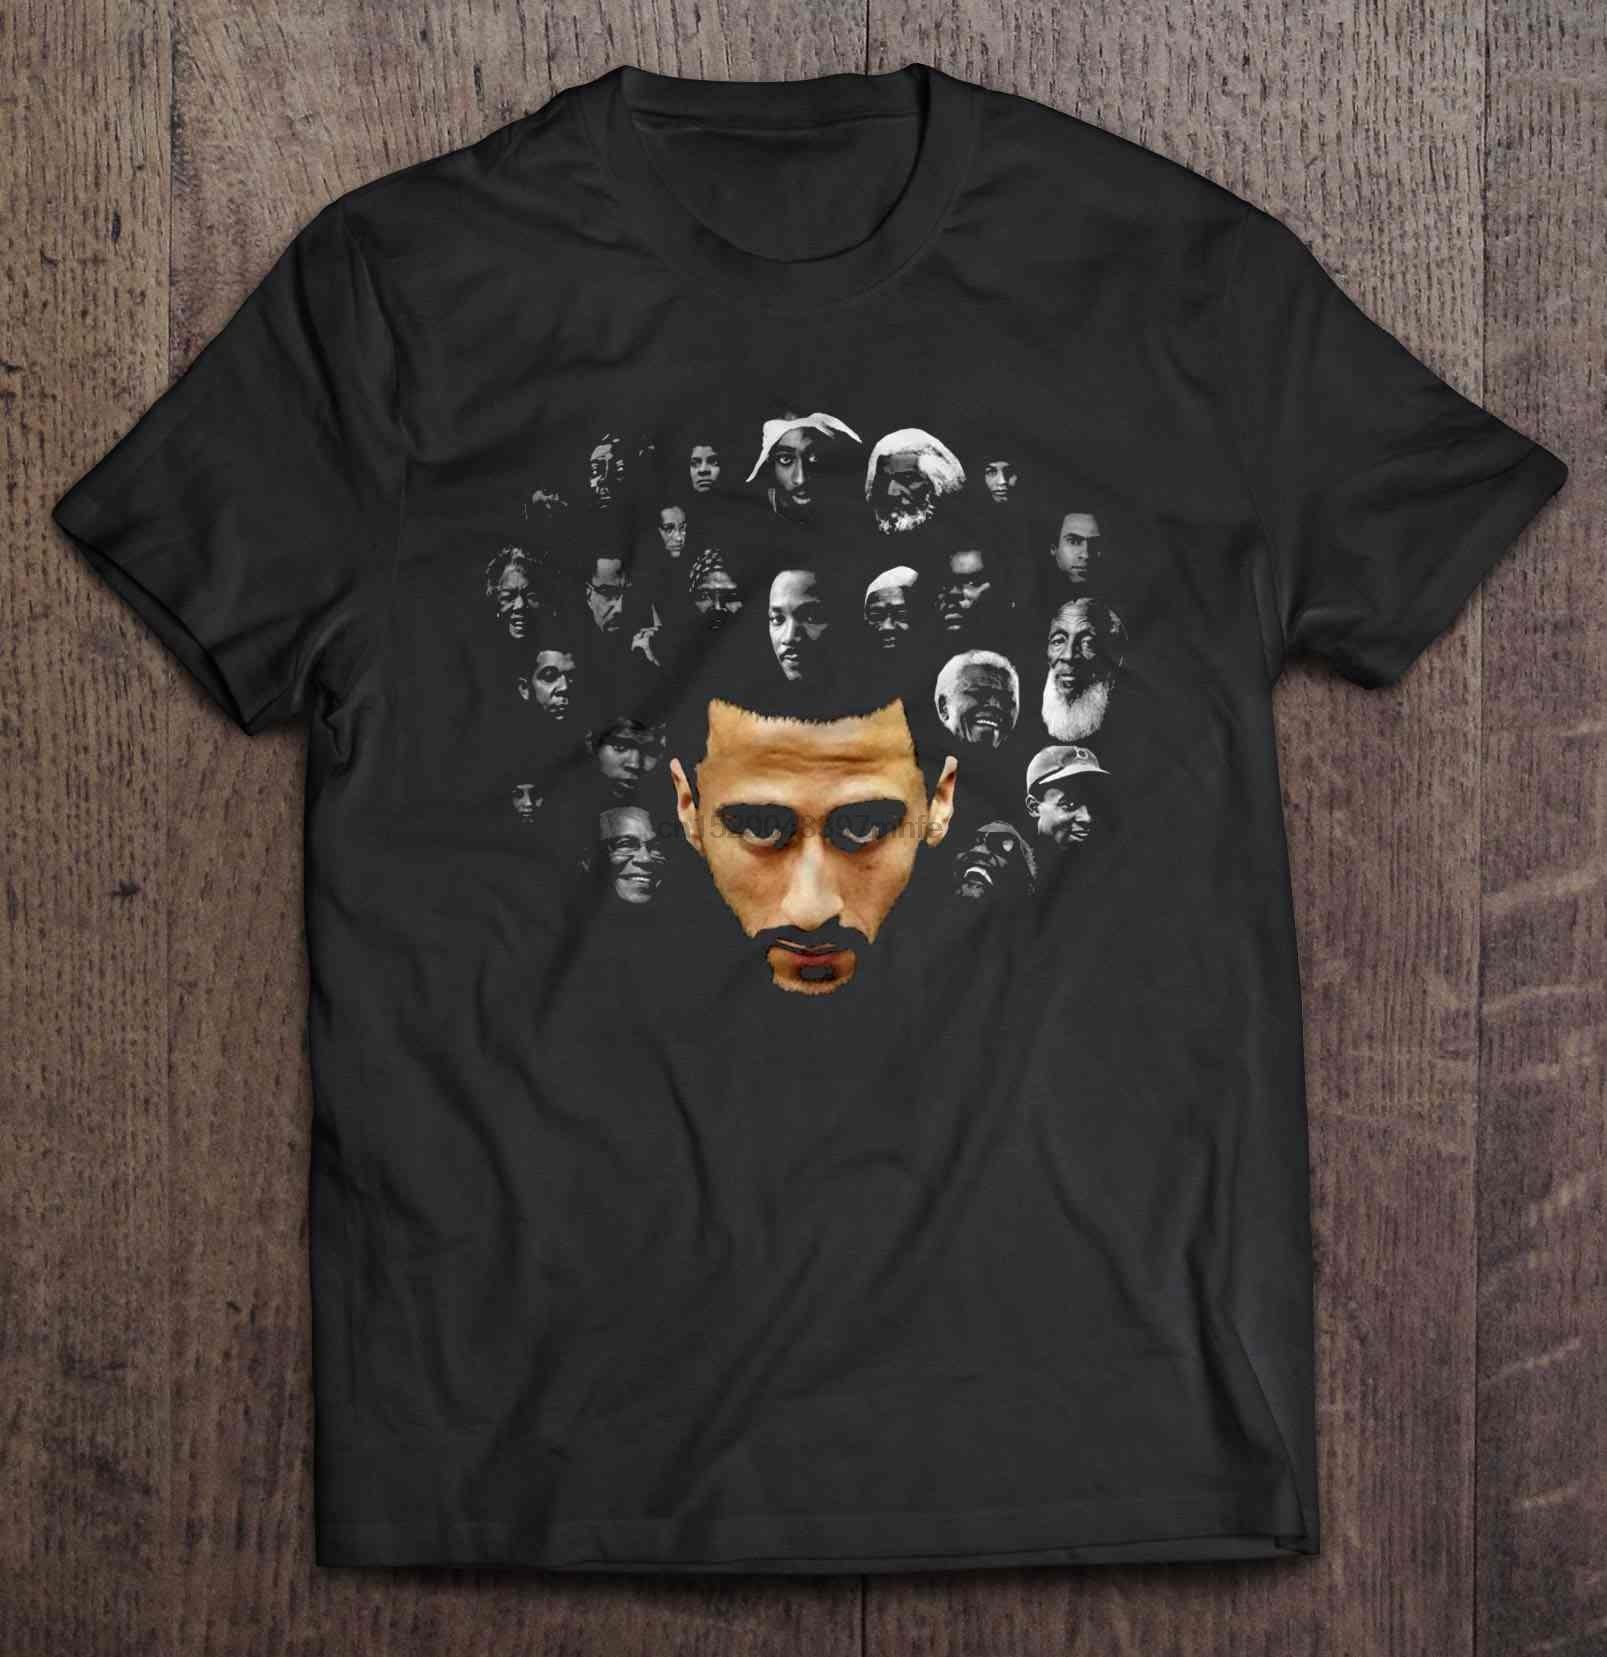 Camiseta de hombre Colin Kaepernick con iconos de Historia Negra camiseta de mujer